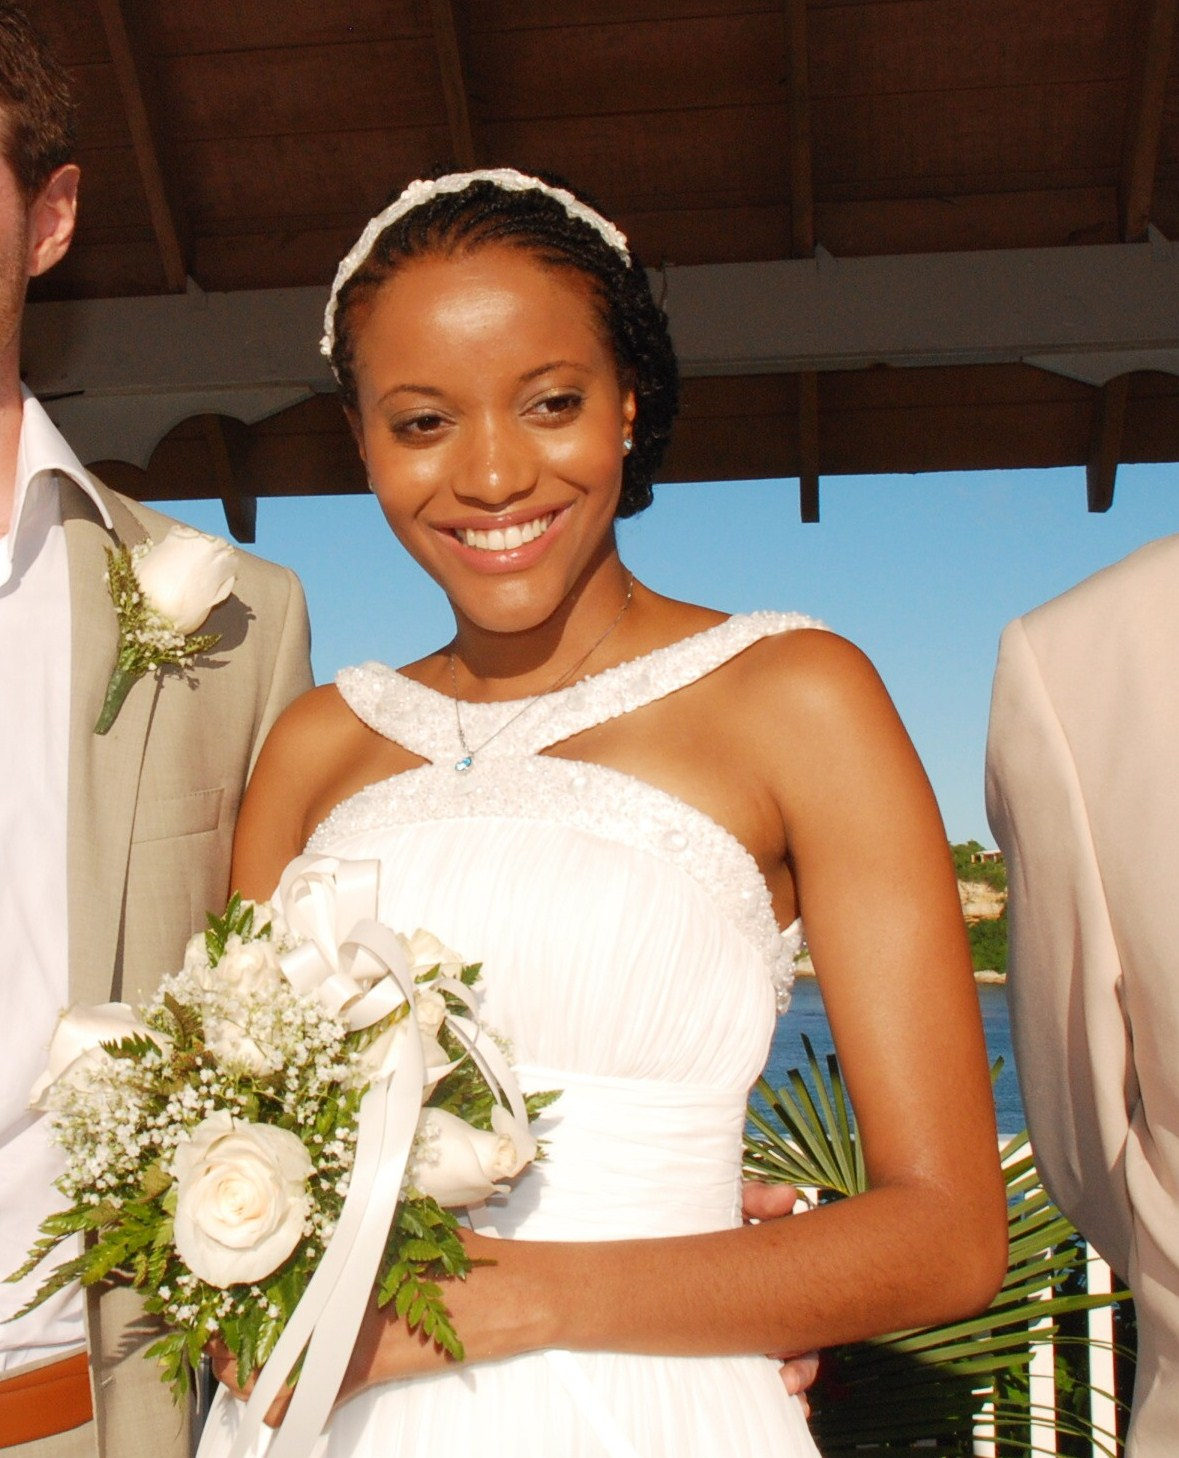 Elegant Hairstyles For Nigerian Brides: African American Wedding Hairstyles & Hairdos: Real Bride